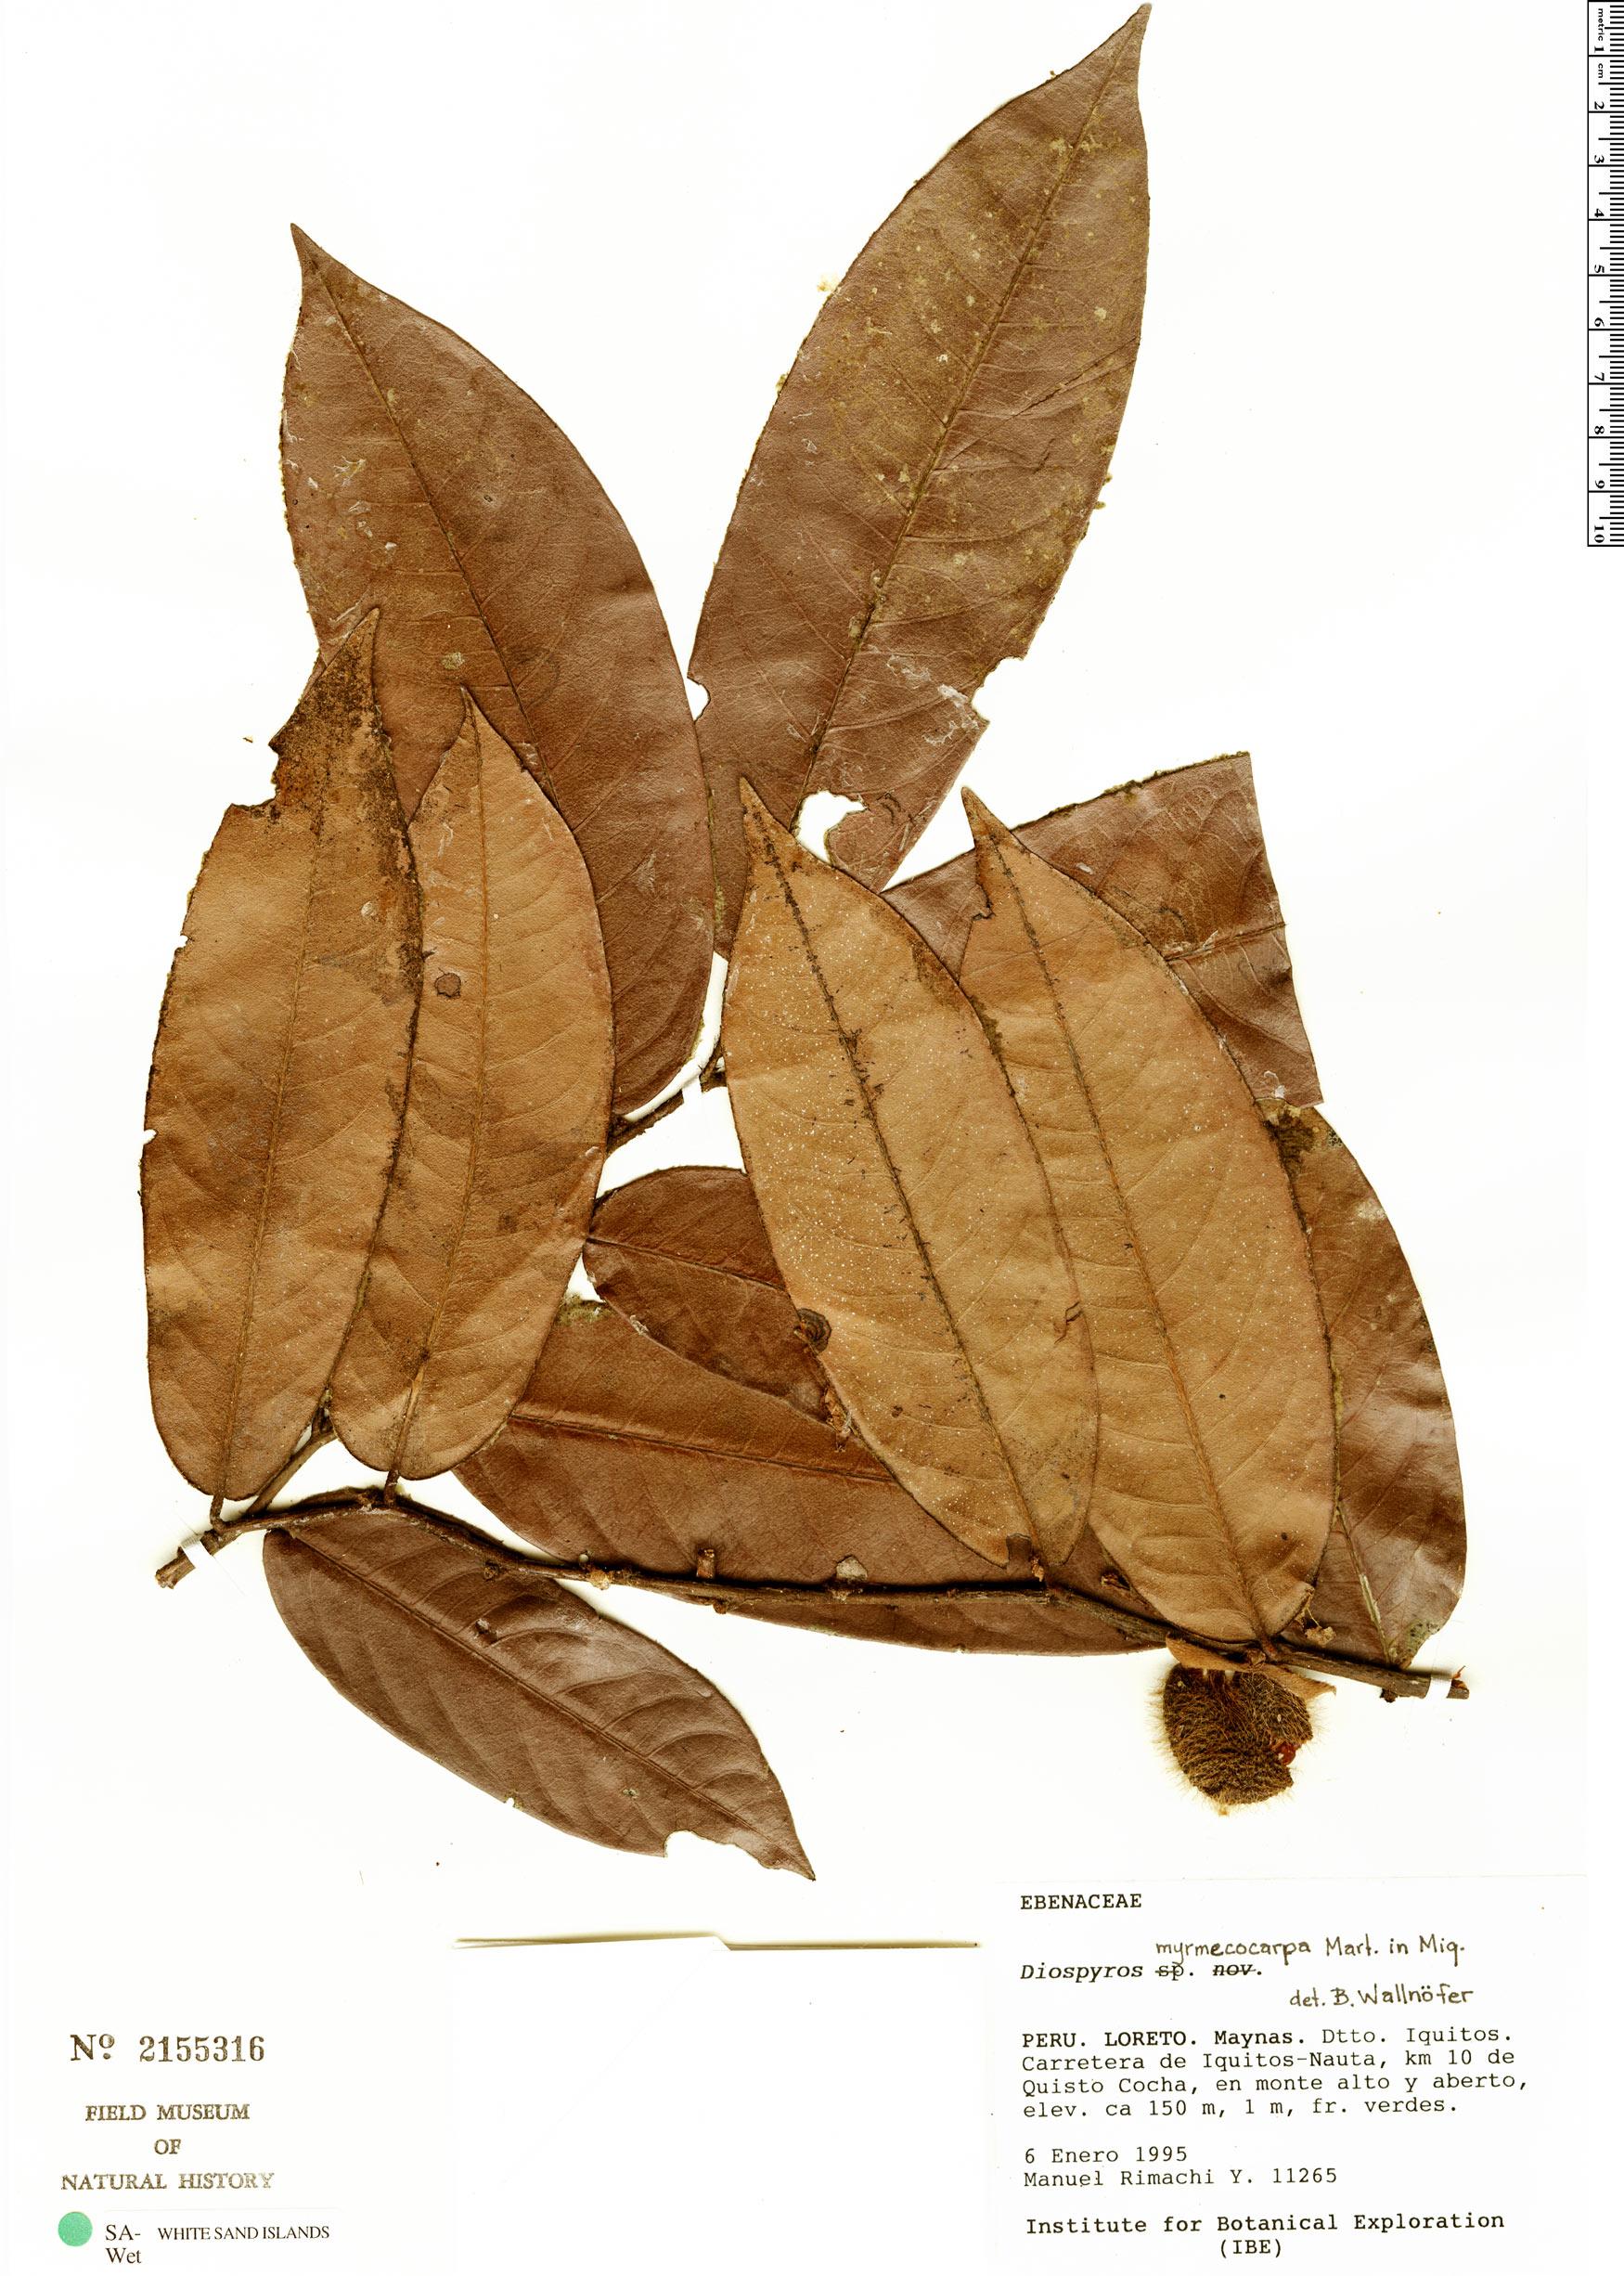 Specimen: Diospyros myrmecocarpa